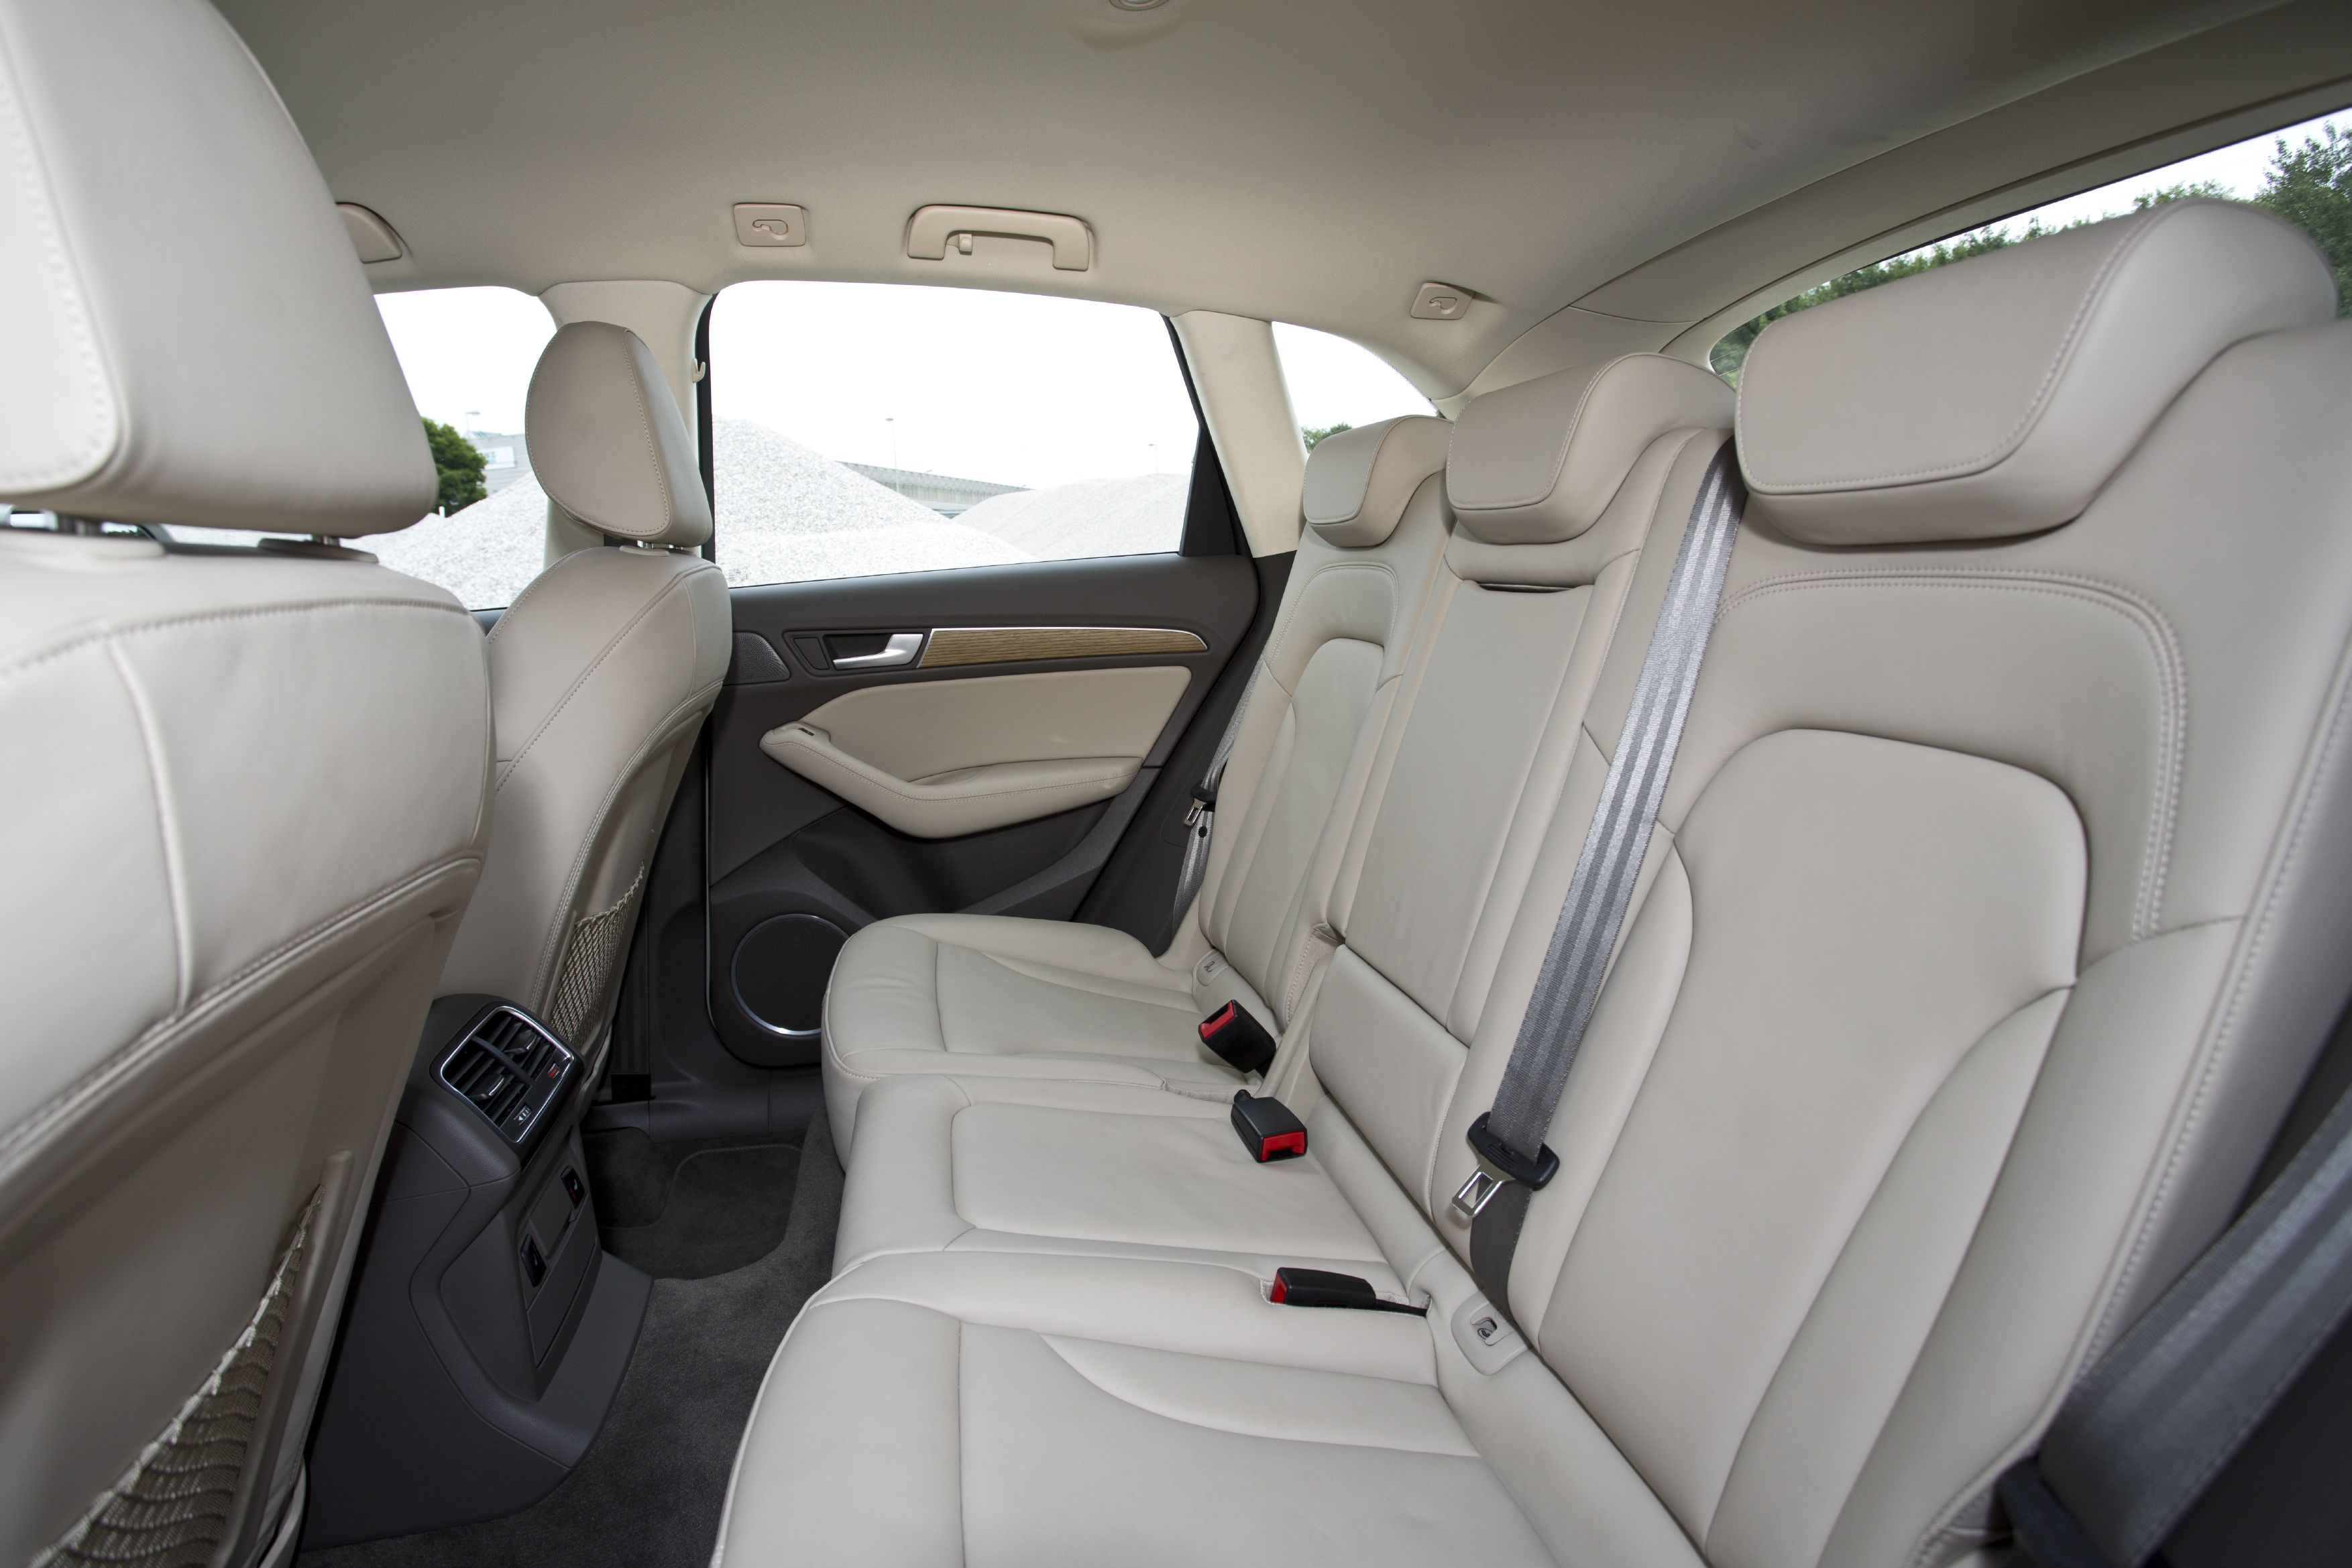 Test Kurzfazit Reisen Mit Dem Audi Q5